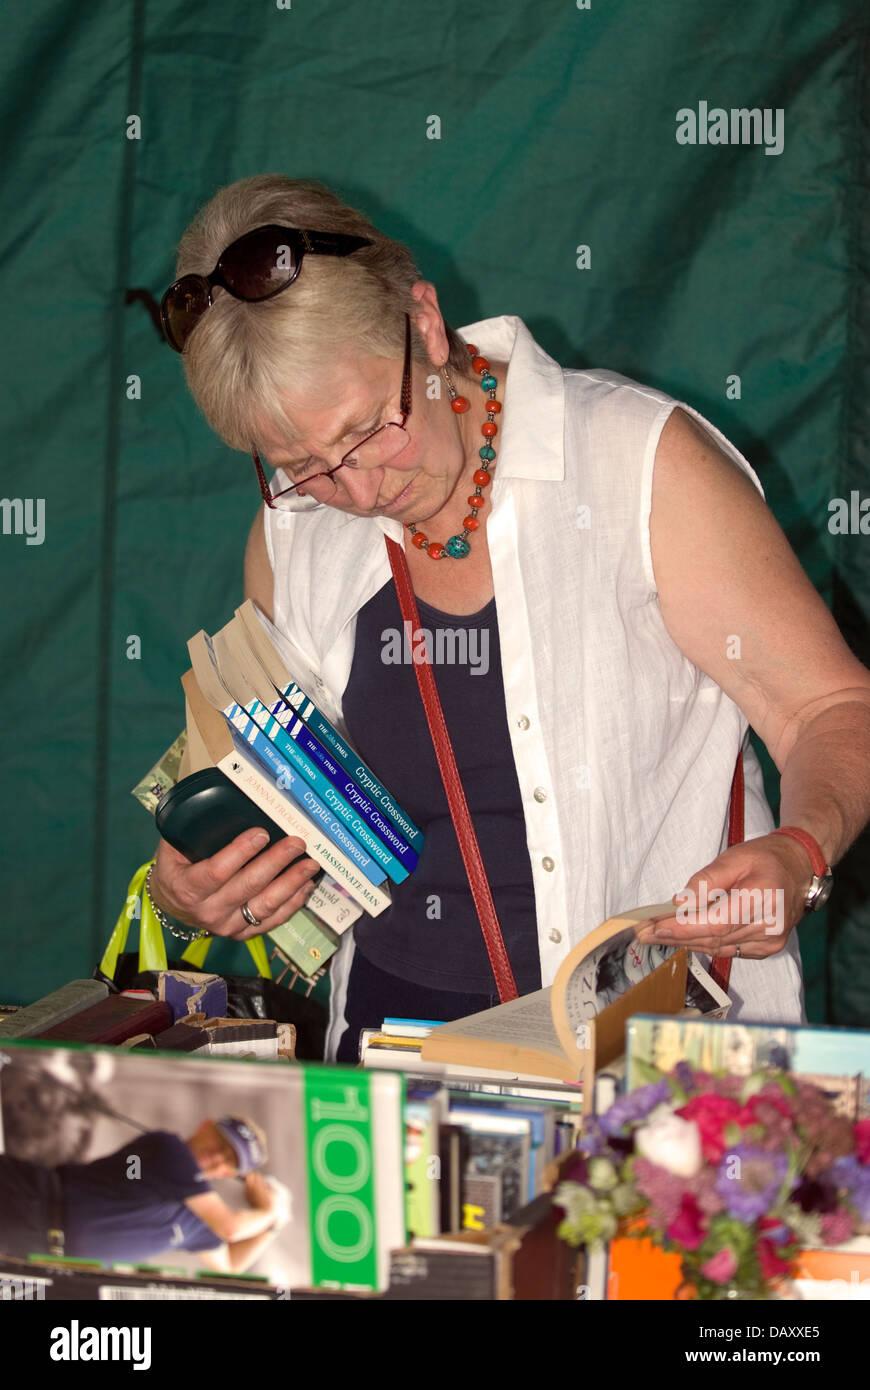 Woman browsing book stall at Worldham Village Fete, Hampshire, UK. Sunday 14 July 2013. - Stock Image